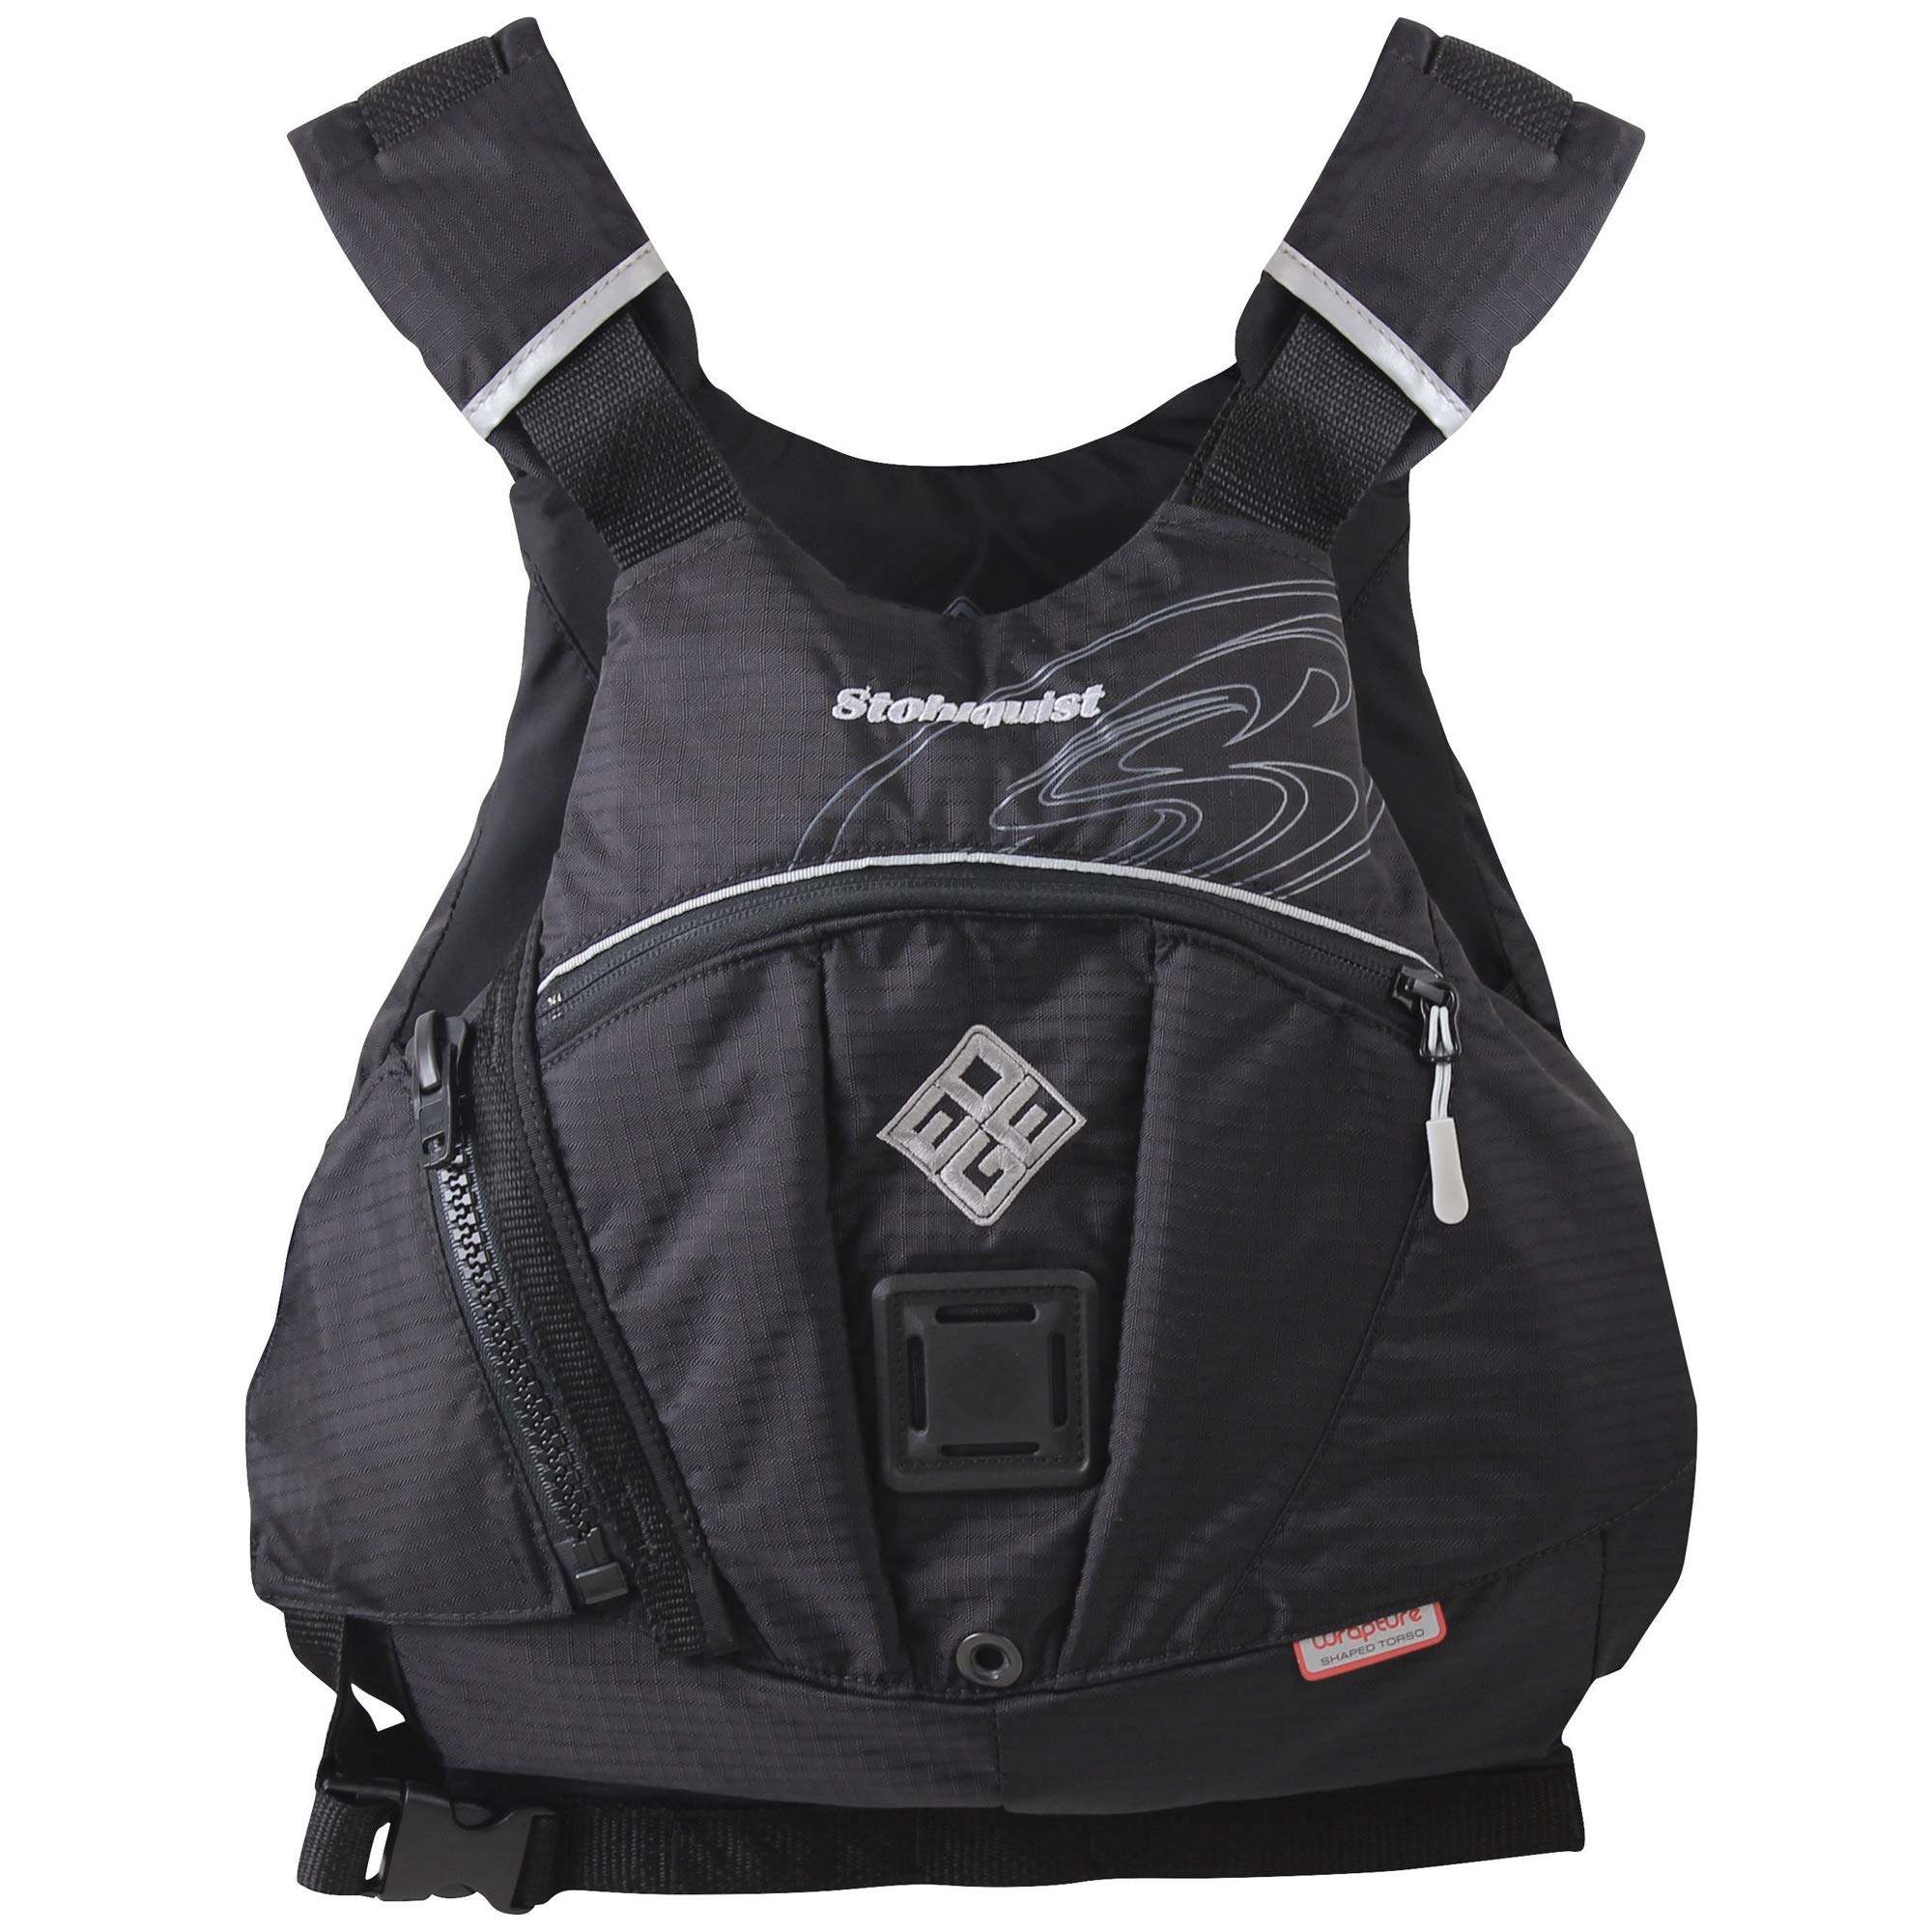 Stohlquist Edge Kayak Lifejacket-Black-S/M